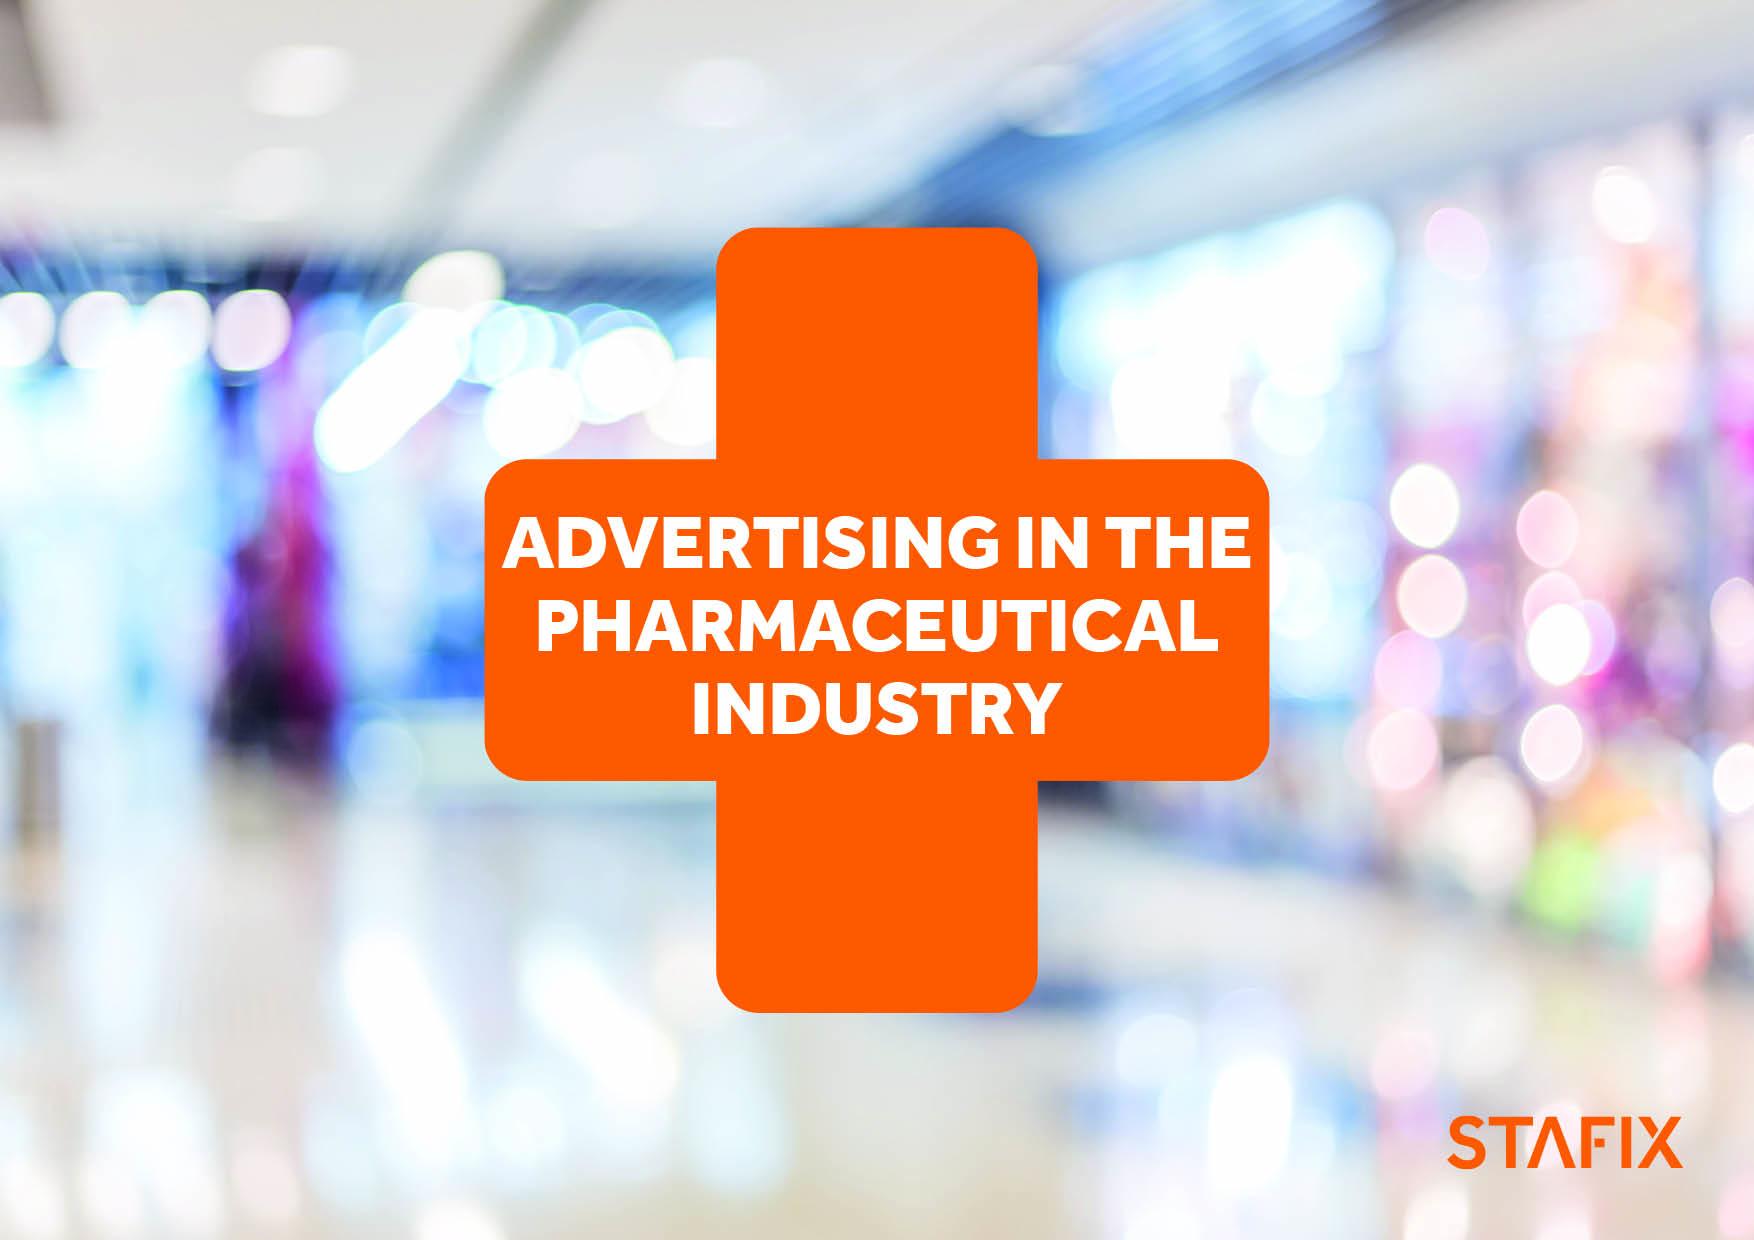 STAFIX_eBOOK_Pharma_11_2017_ENG_web.jpg